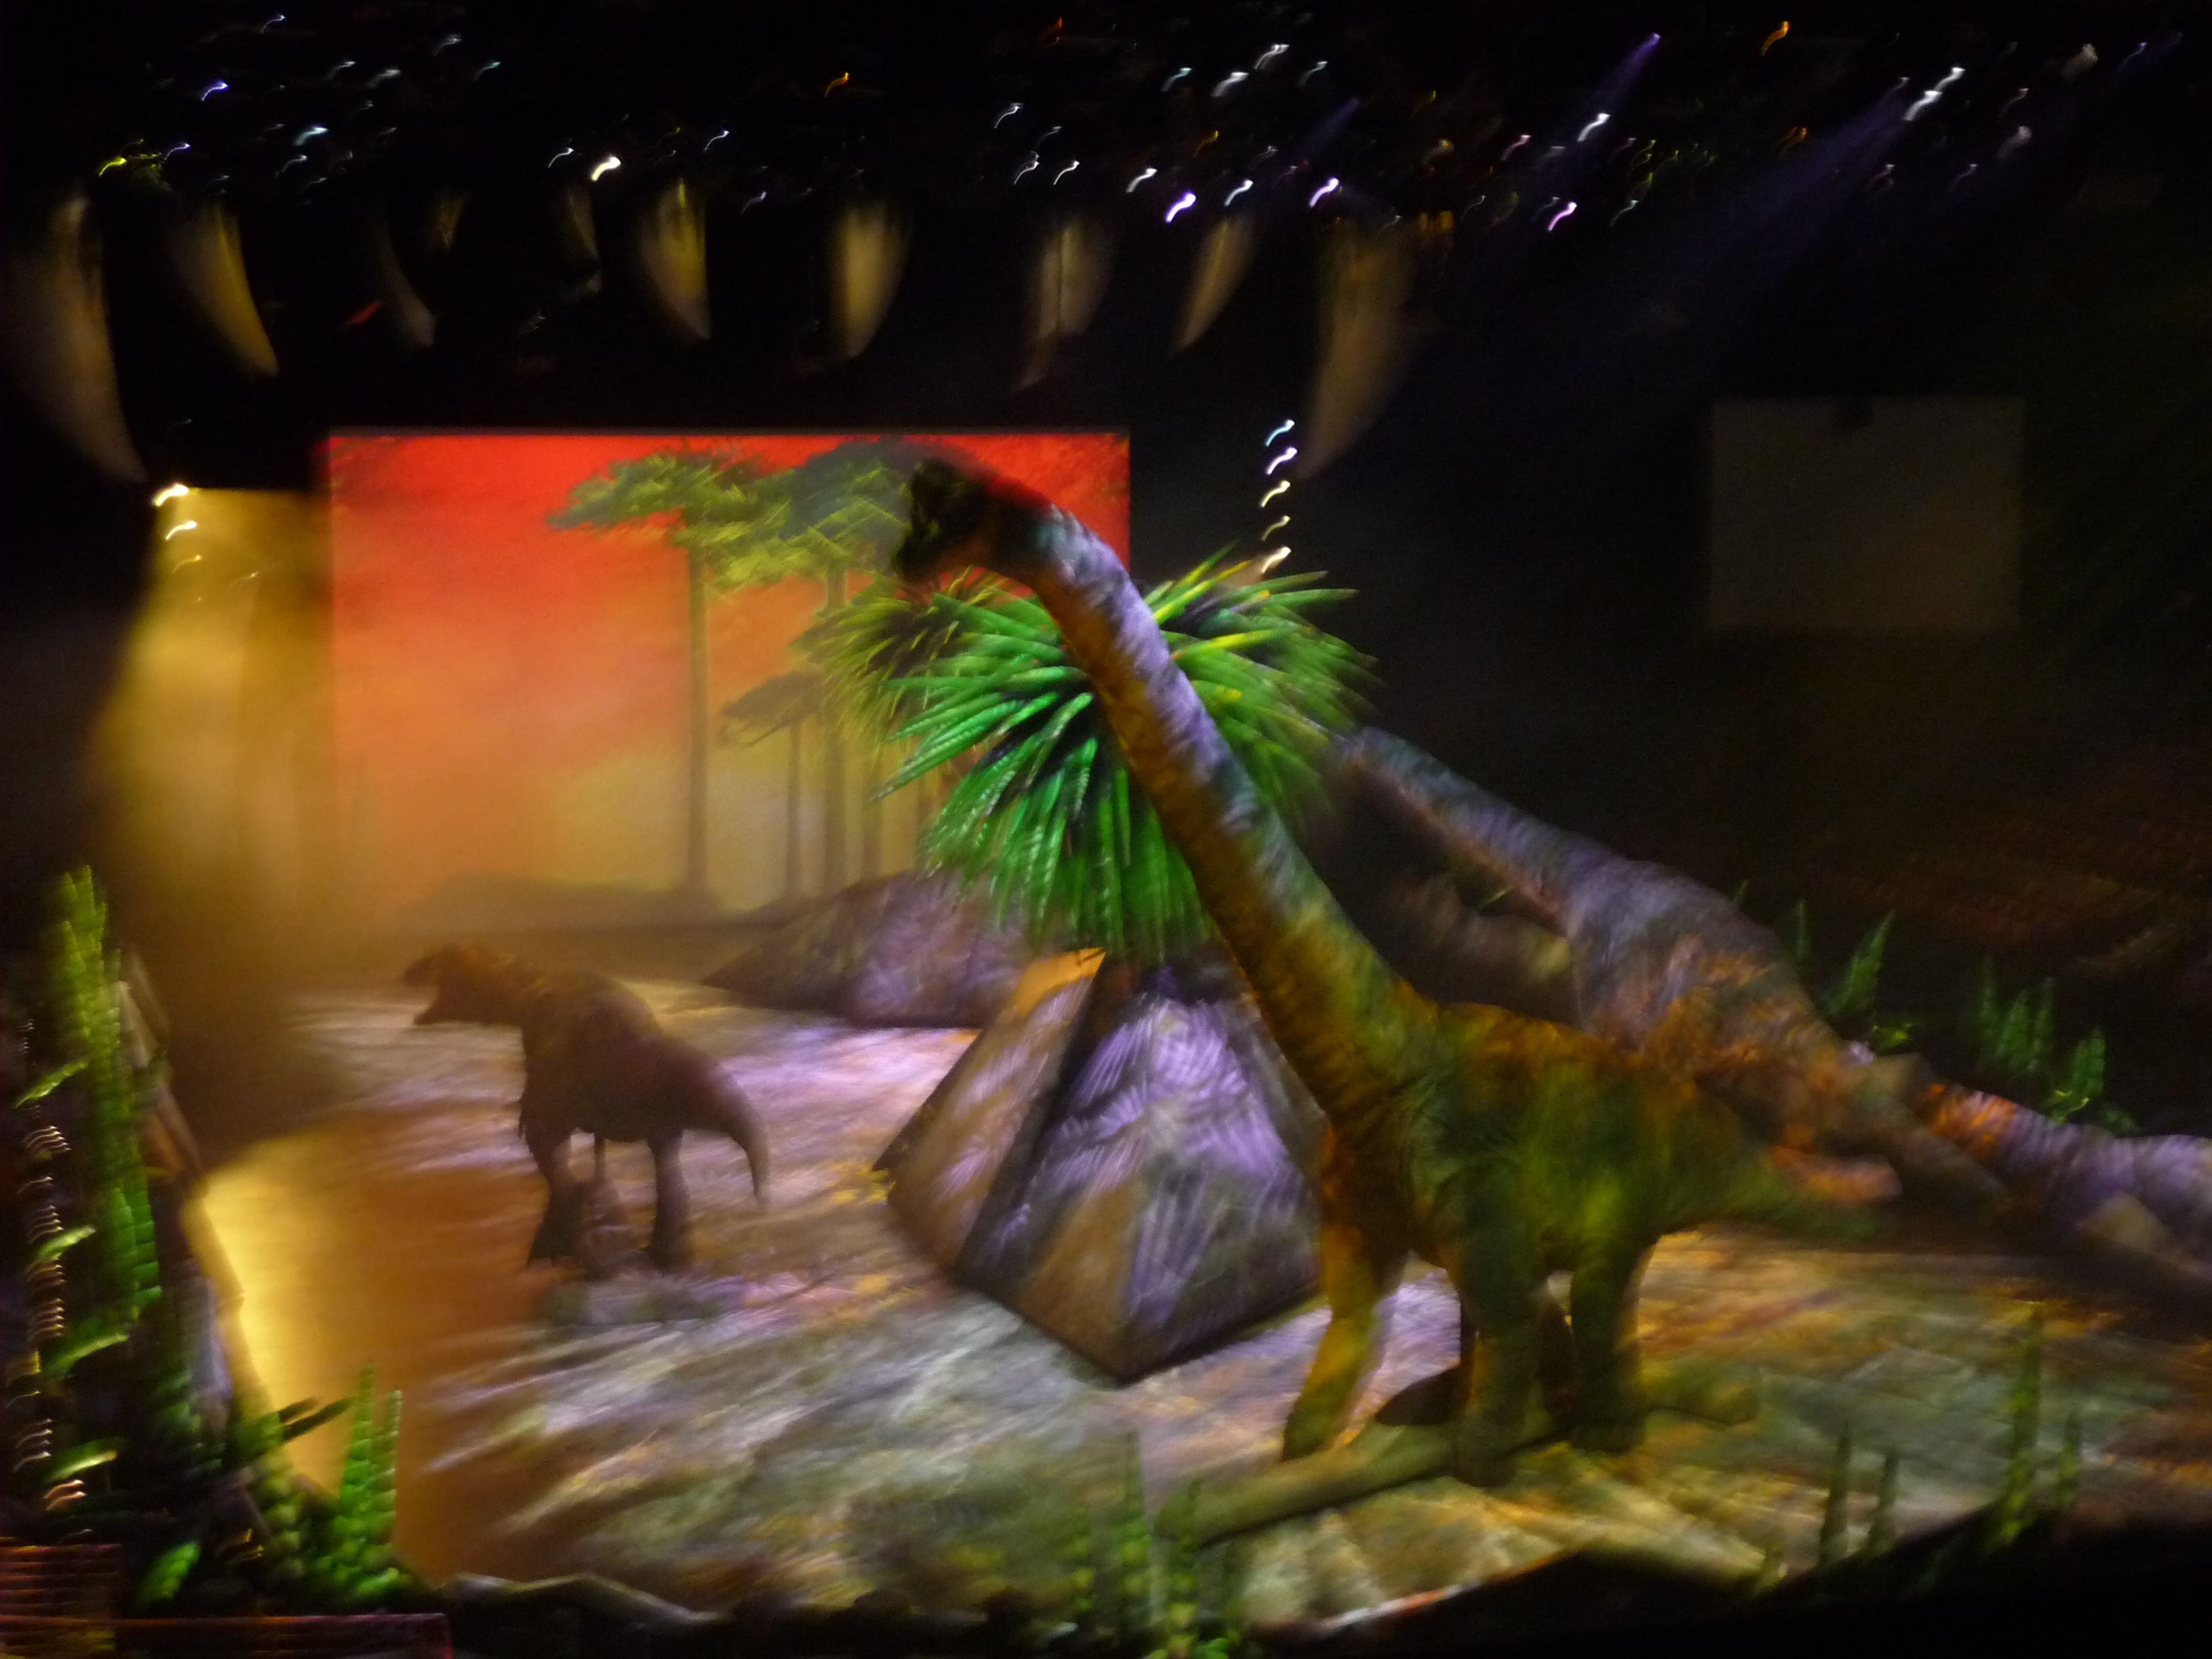 Walking with Dinosaurs #ColonialLifeArena #CLAevents #FamouslyHot #ColumbiaSC #SCTweets #CLAambassador #Gamecocks